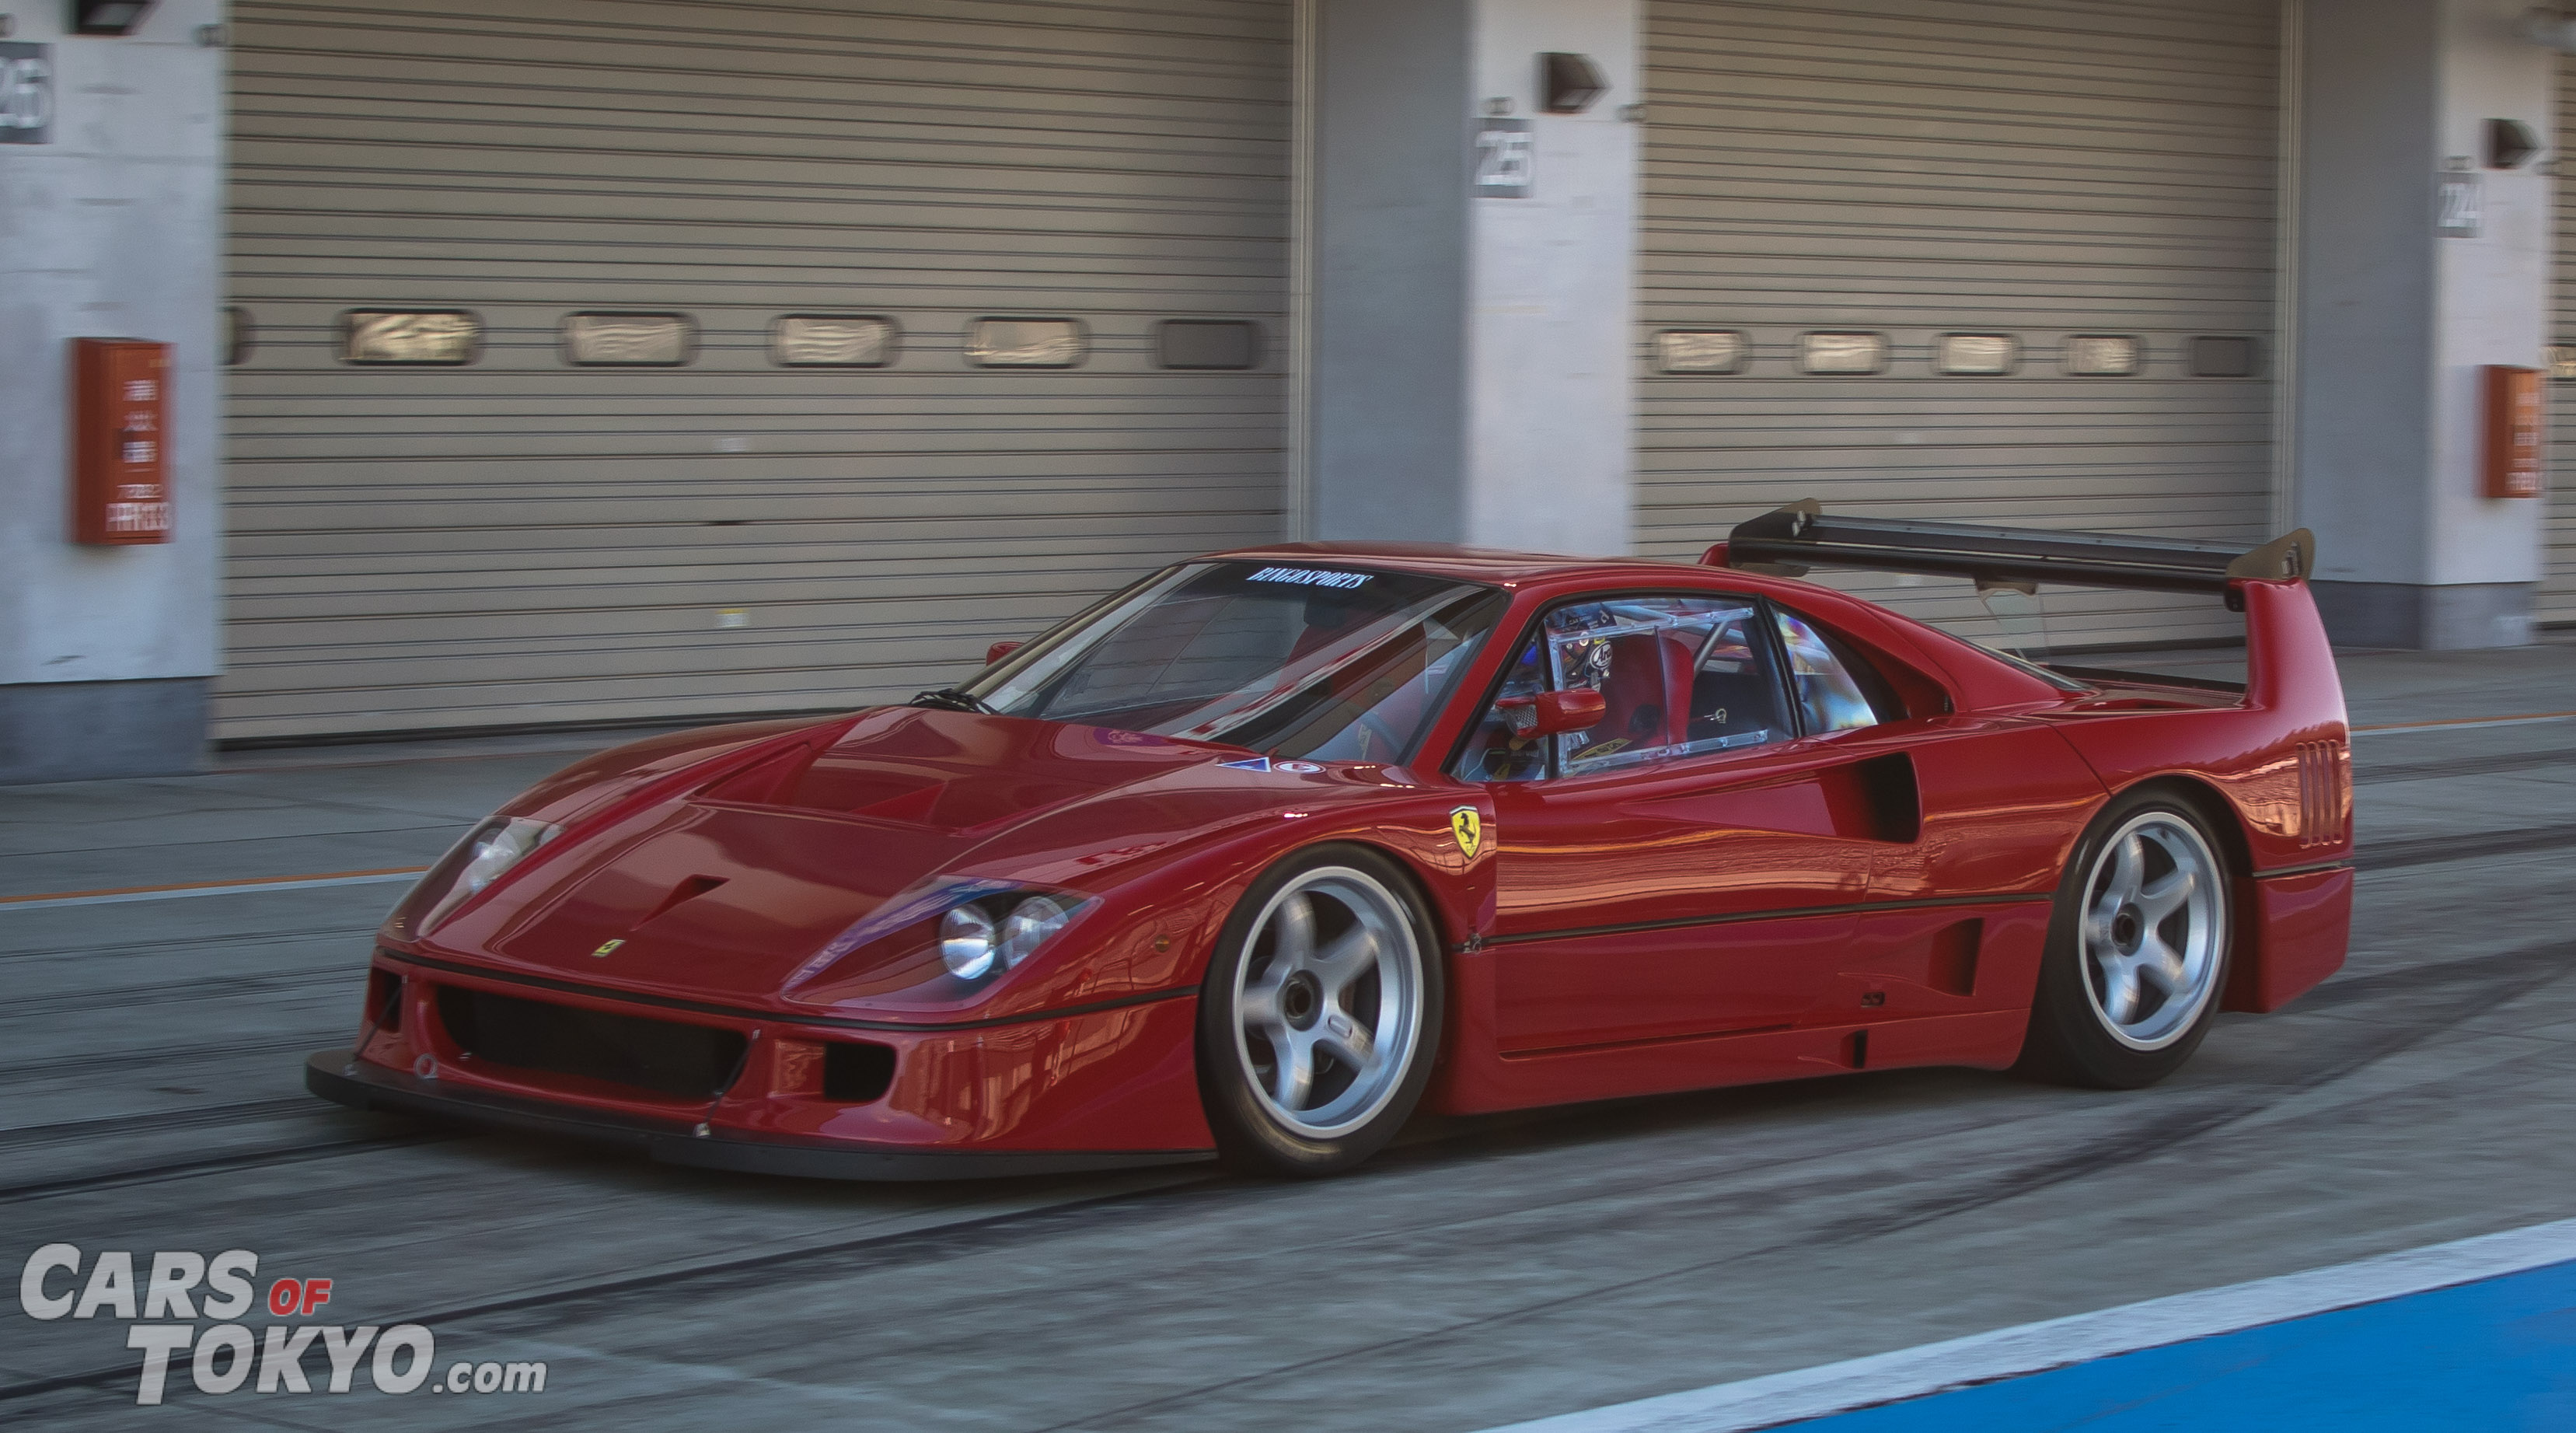 Cars of Tokyo Classic Ferrari F40 LM